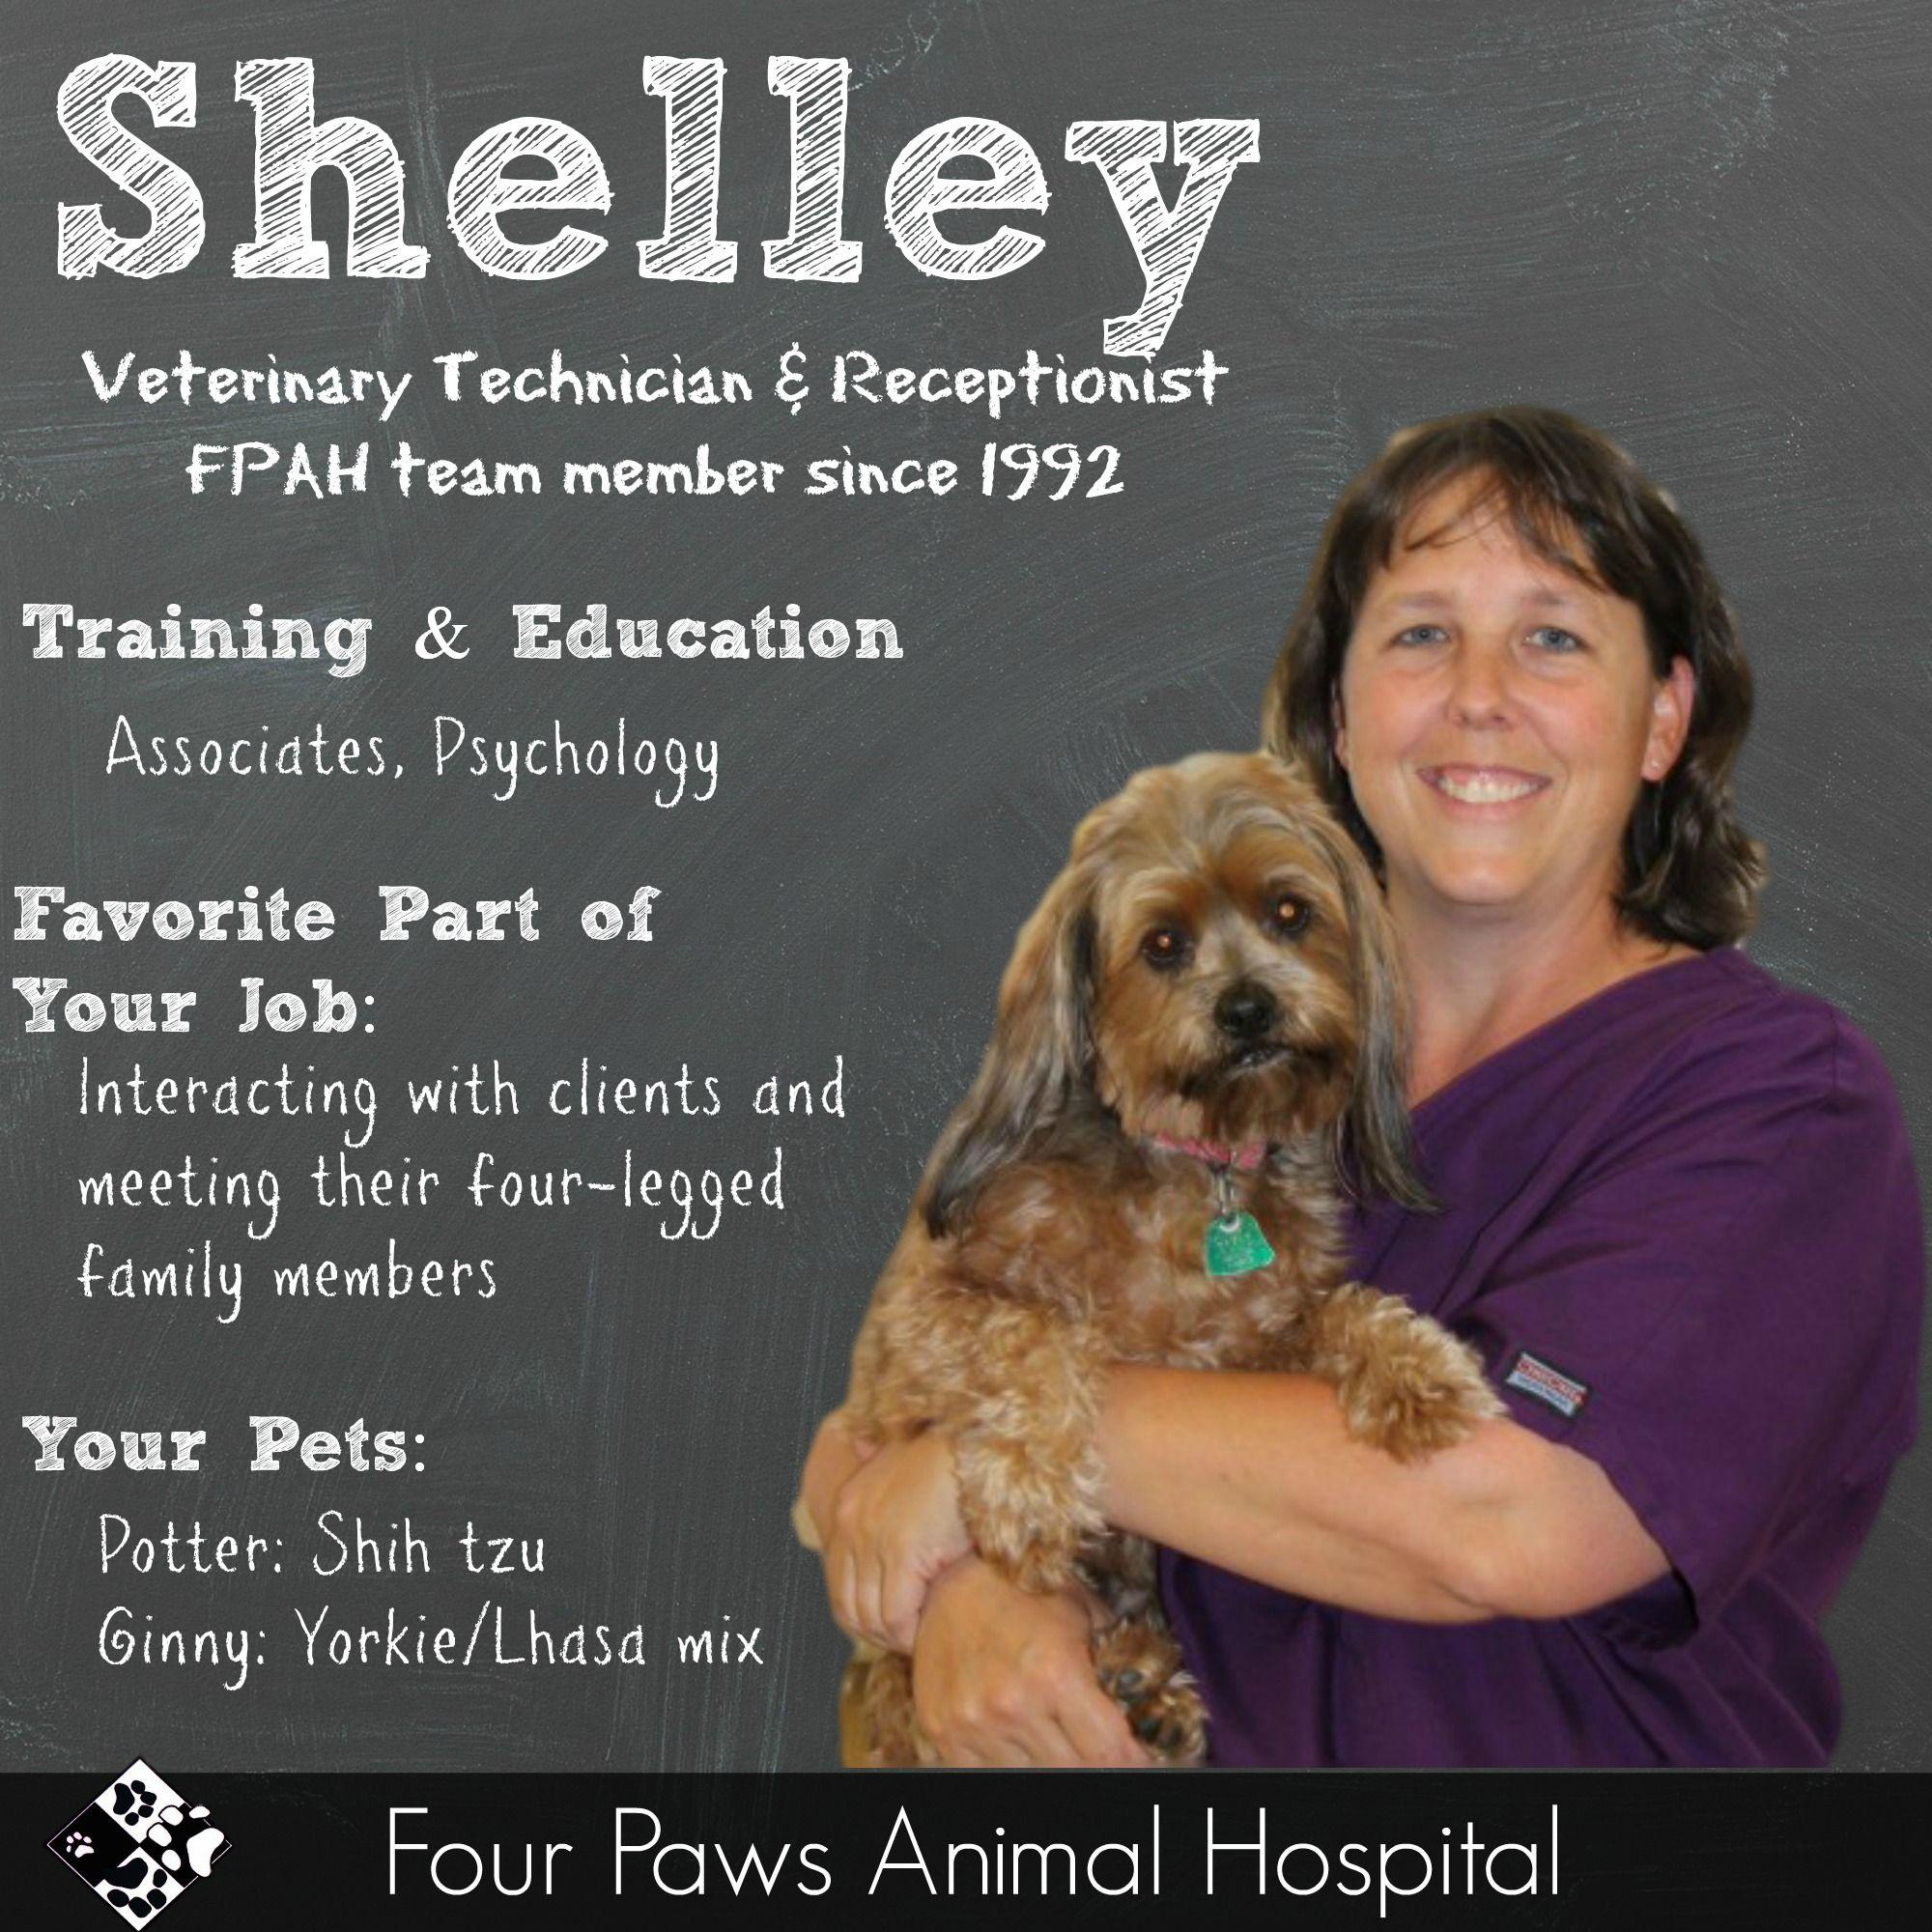 Shelley Animal Hospital Veterinary Technician Animals